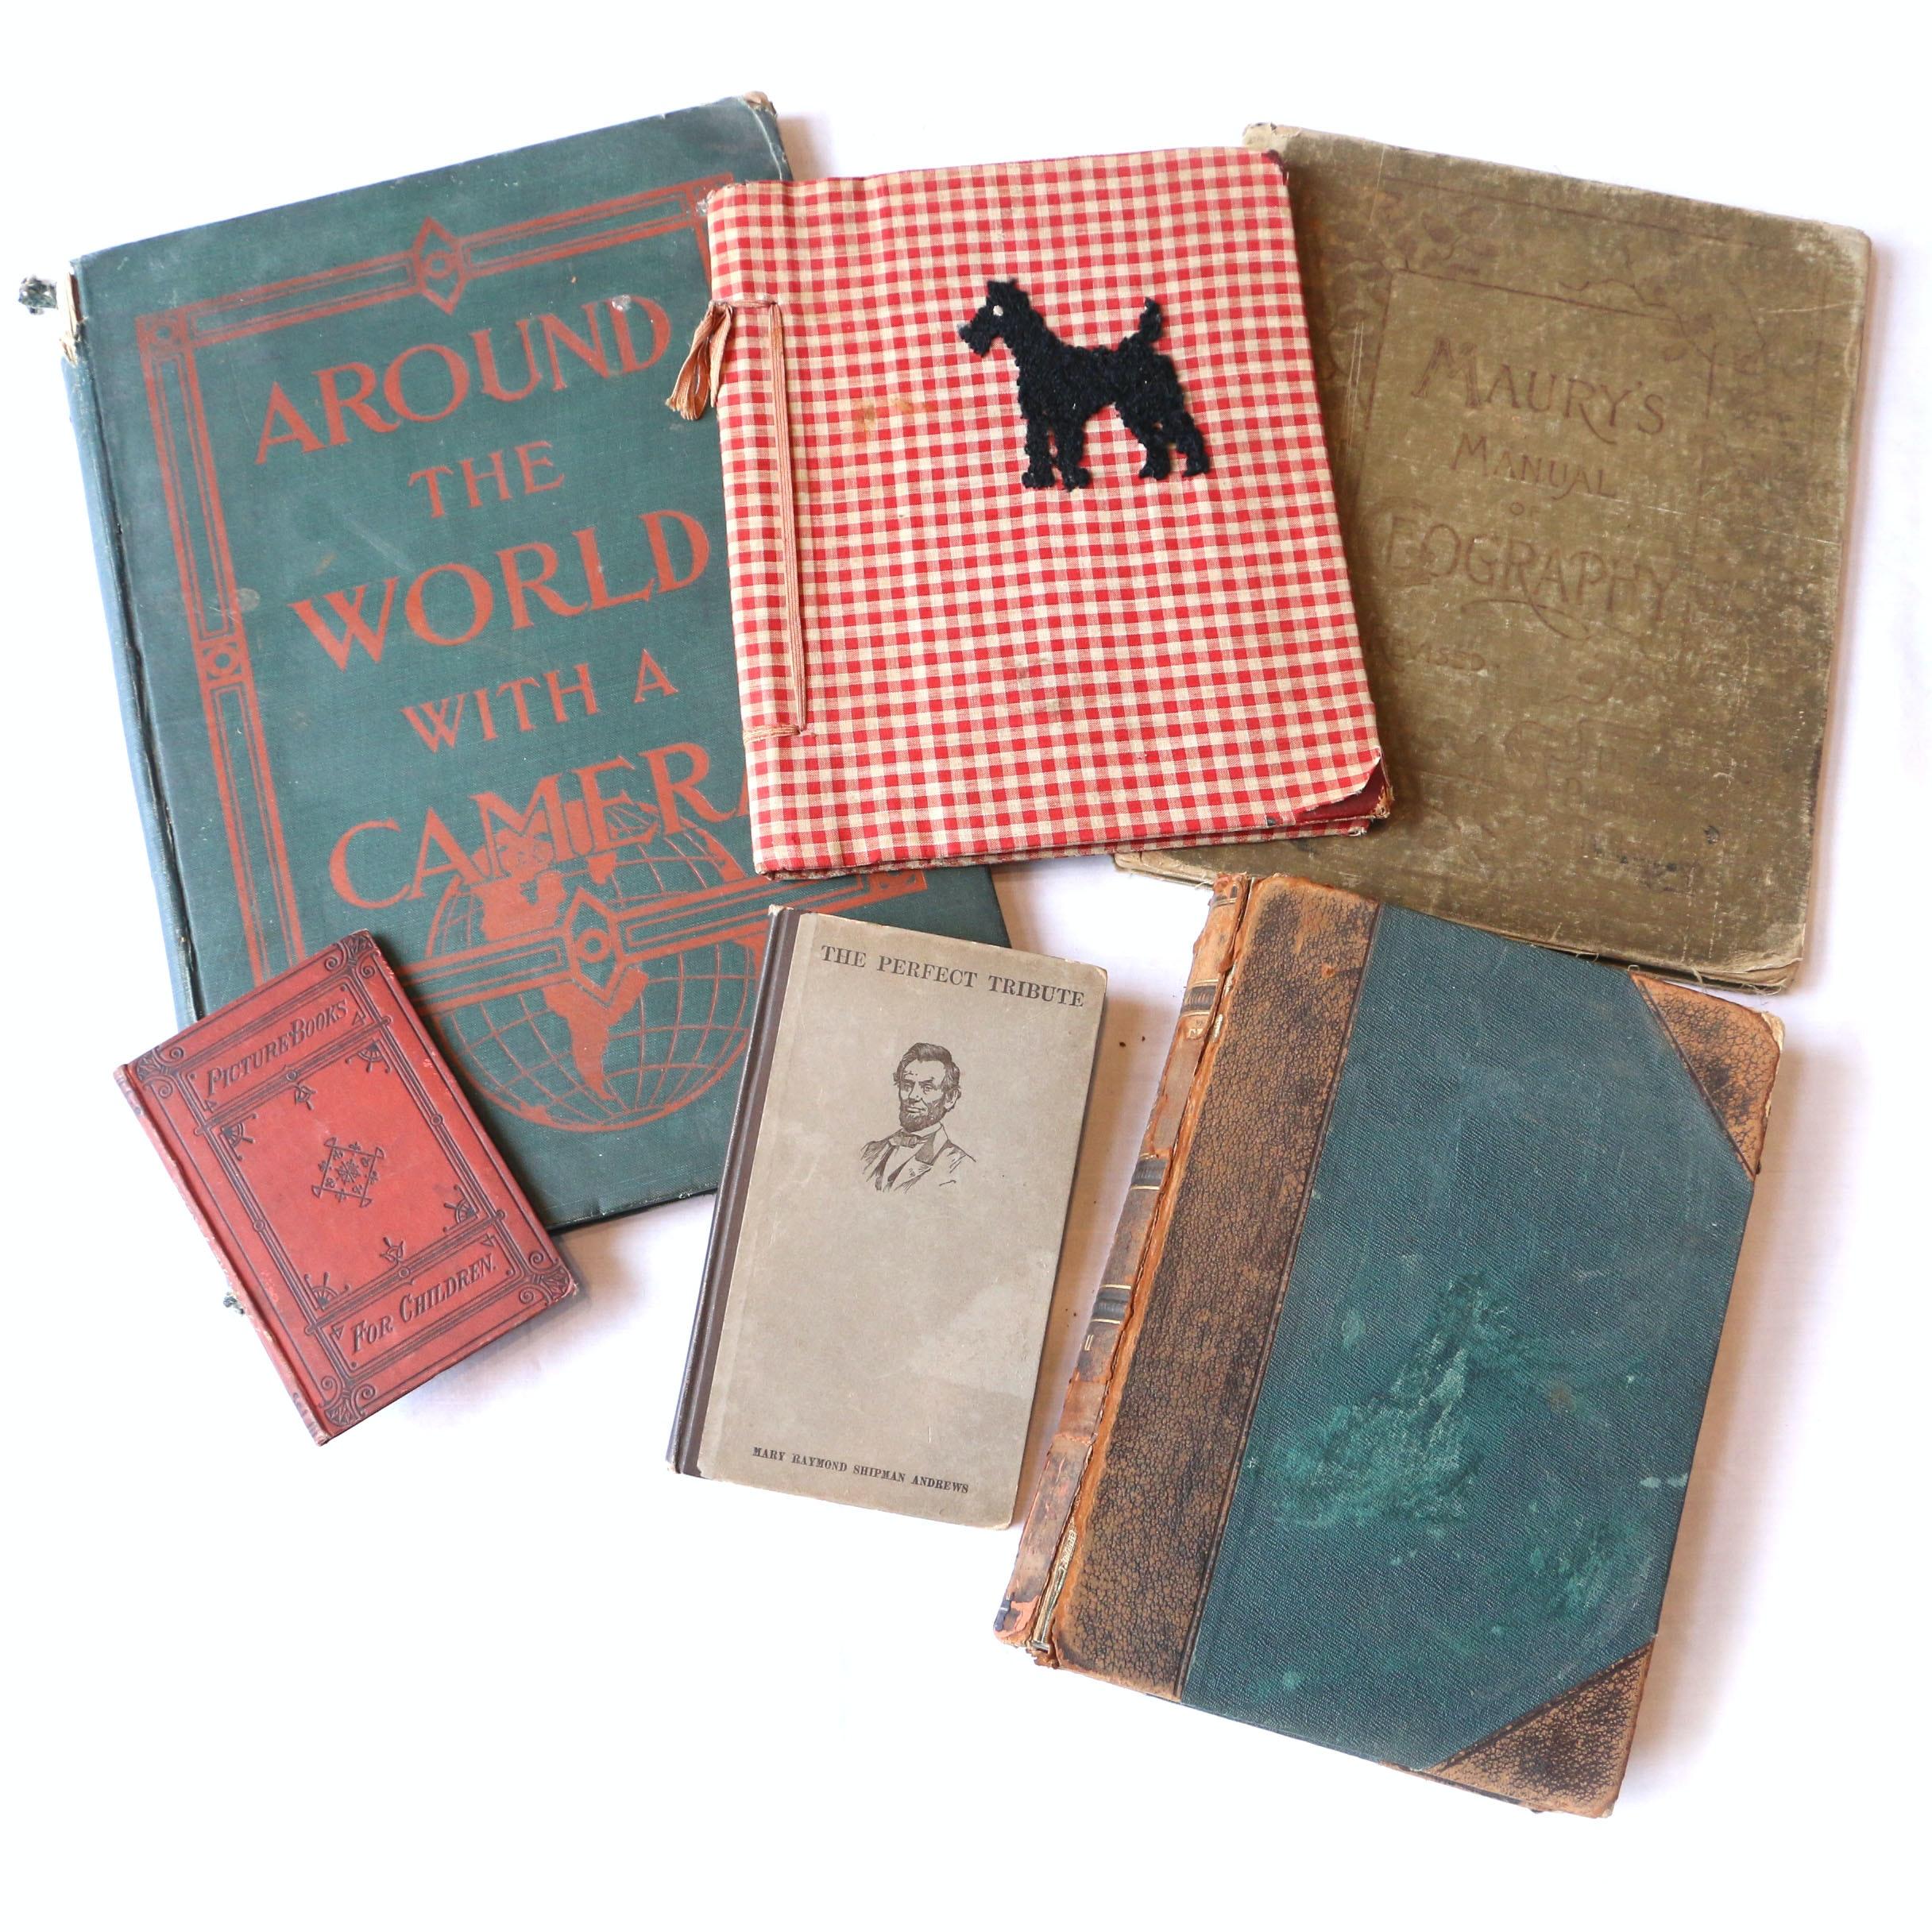 1931 Handmade Fabric Children's Book and Antique Books